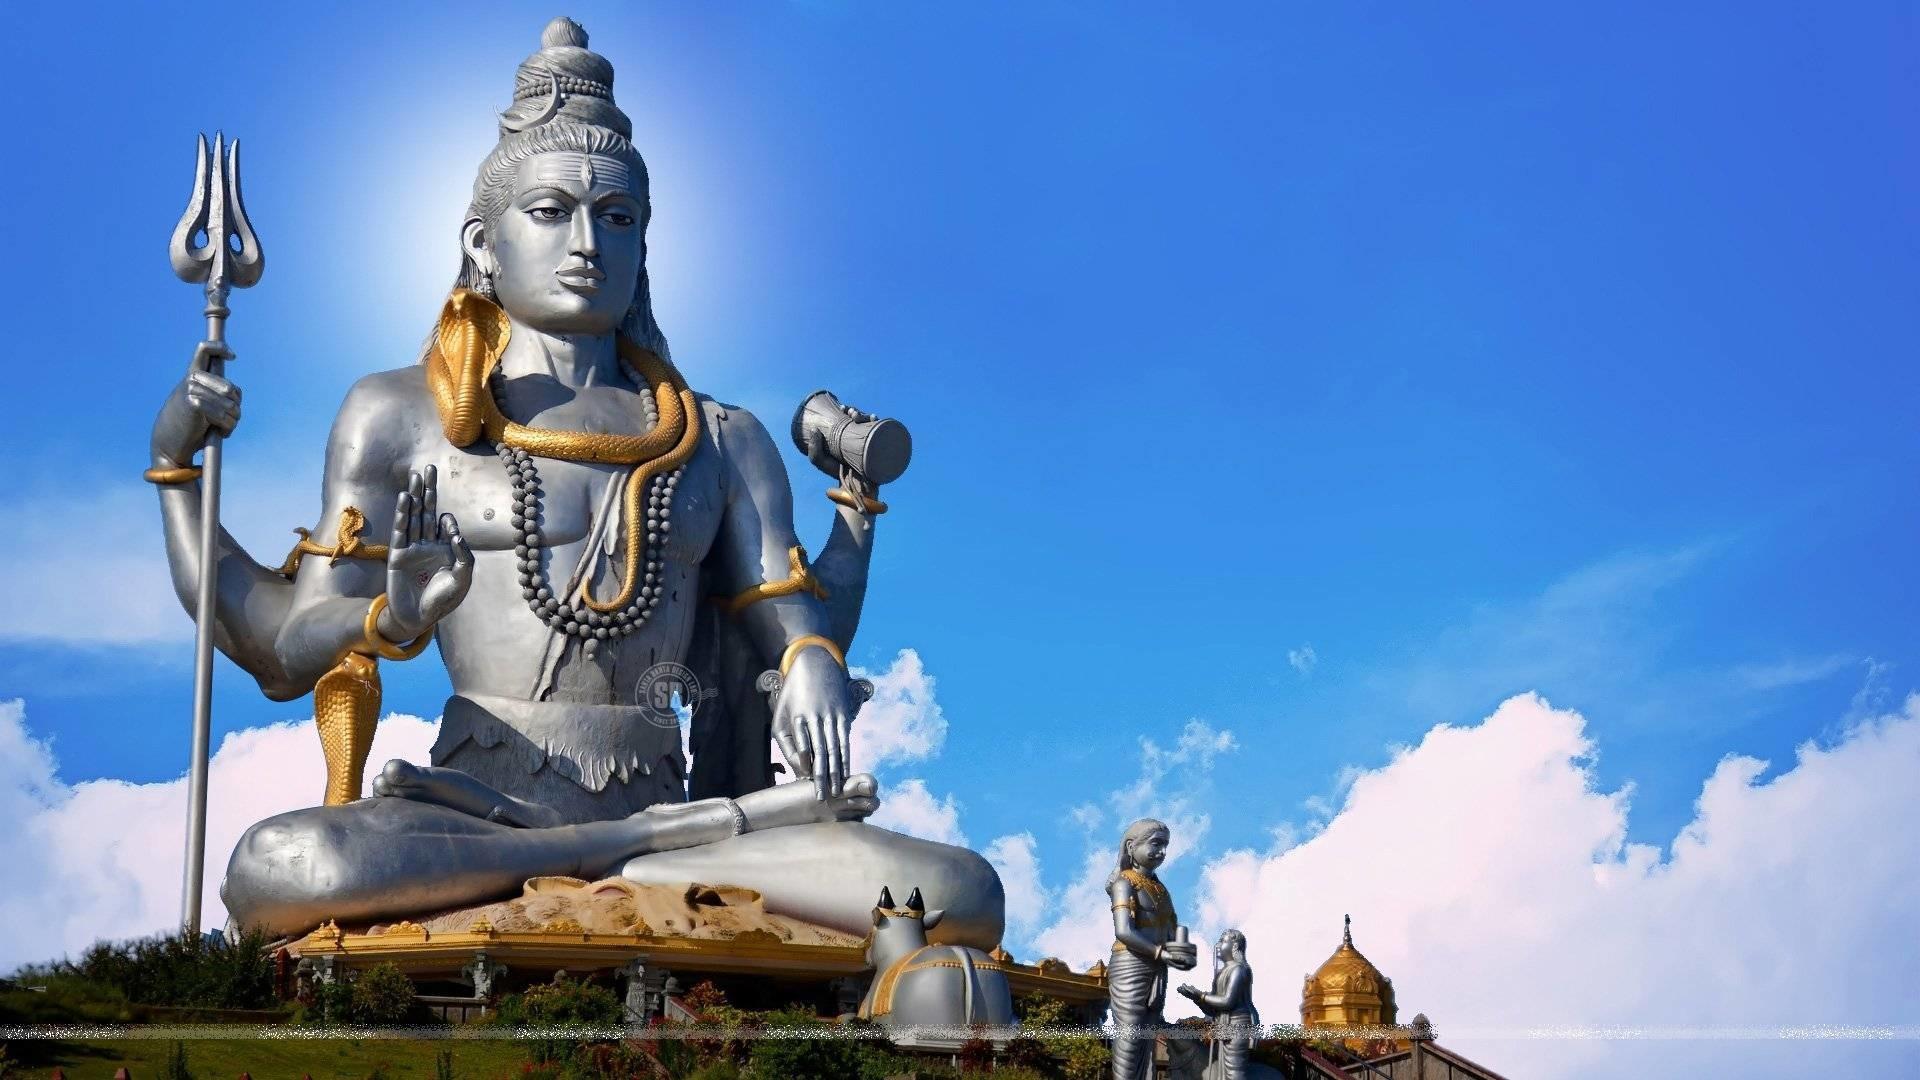 Shankar Bhagwan Wallpaper 3d Hindu God Hd Wallpapers 1080p 68 Images